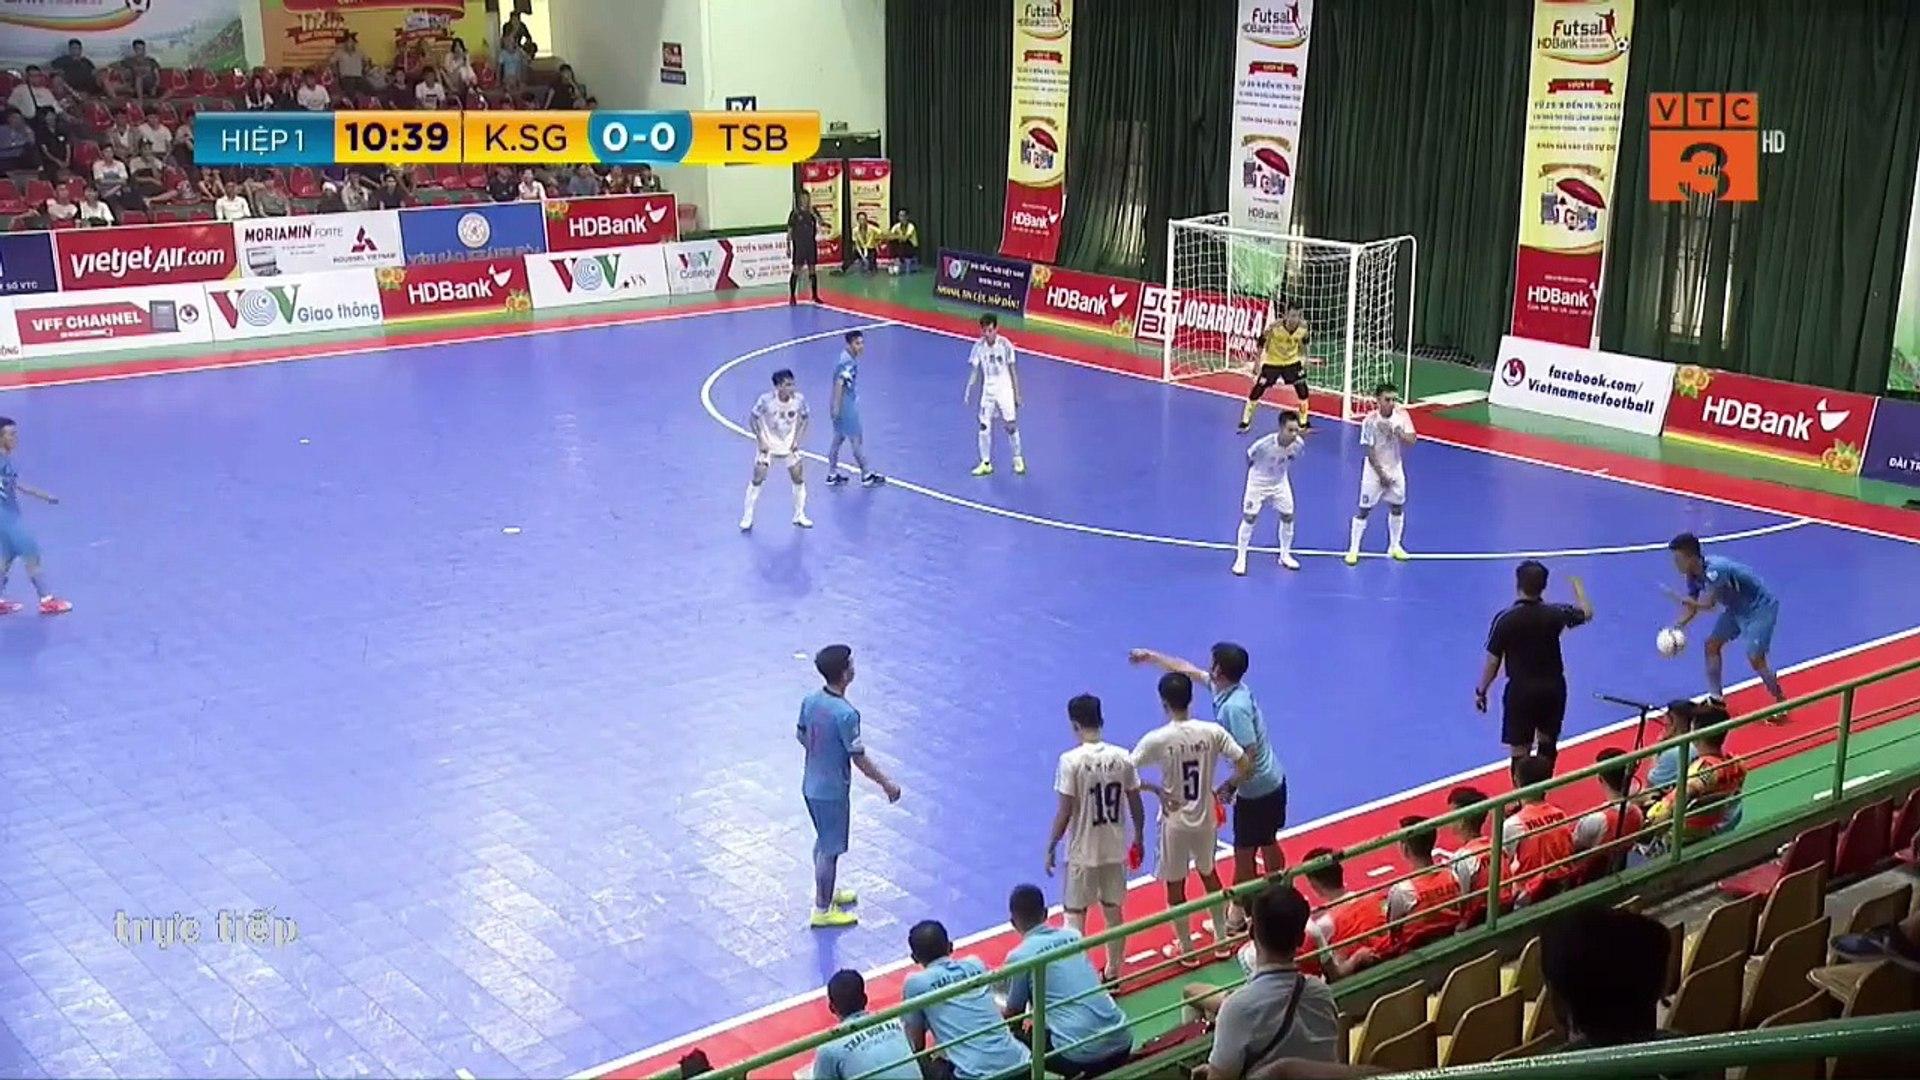 Trực tiếp | Kardiachain SG - Thái Sơn Bắc | Futsal HDBank 2019 | VFF Channel